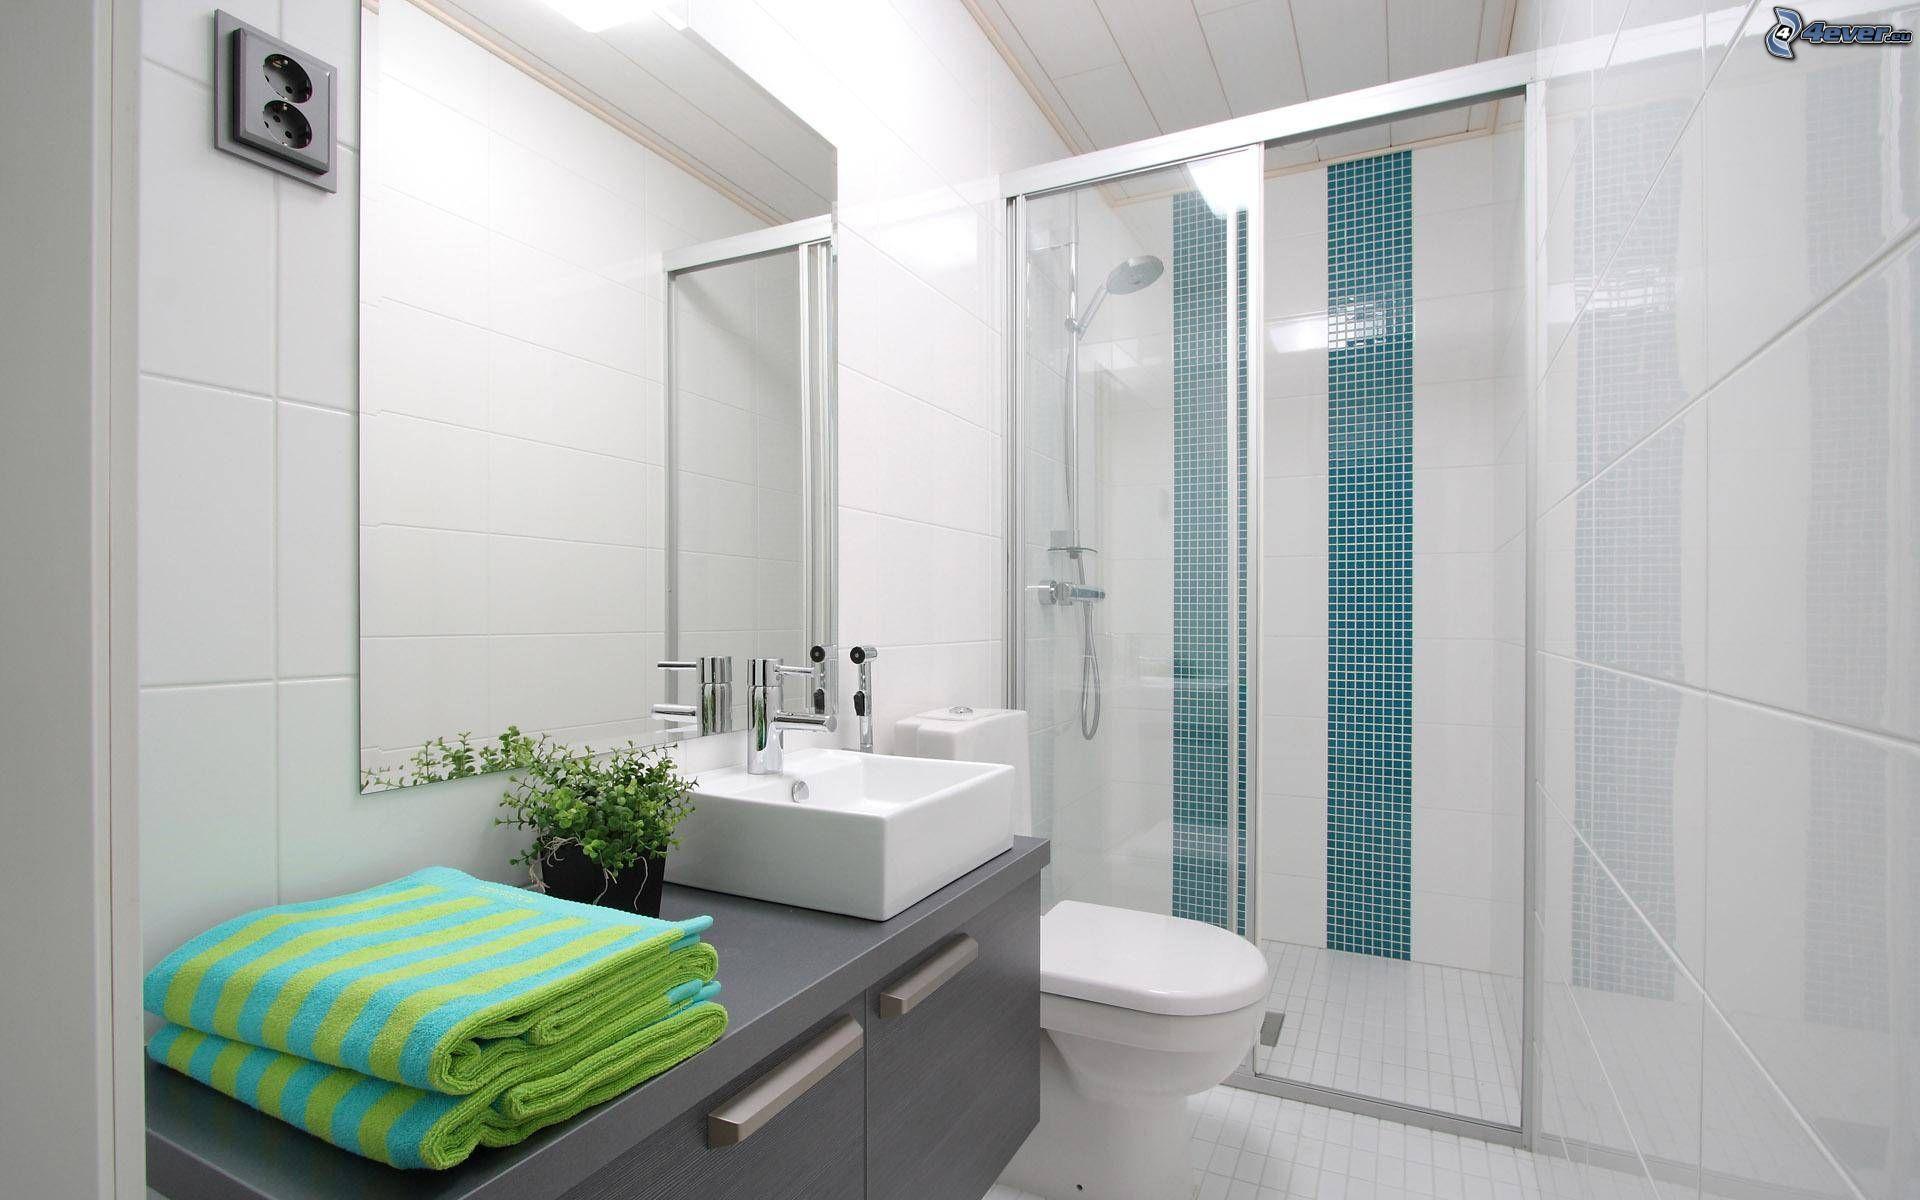 Salle de bains for Lavabo coin salle bain